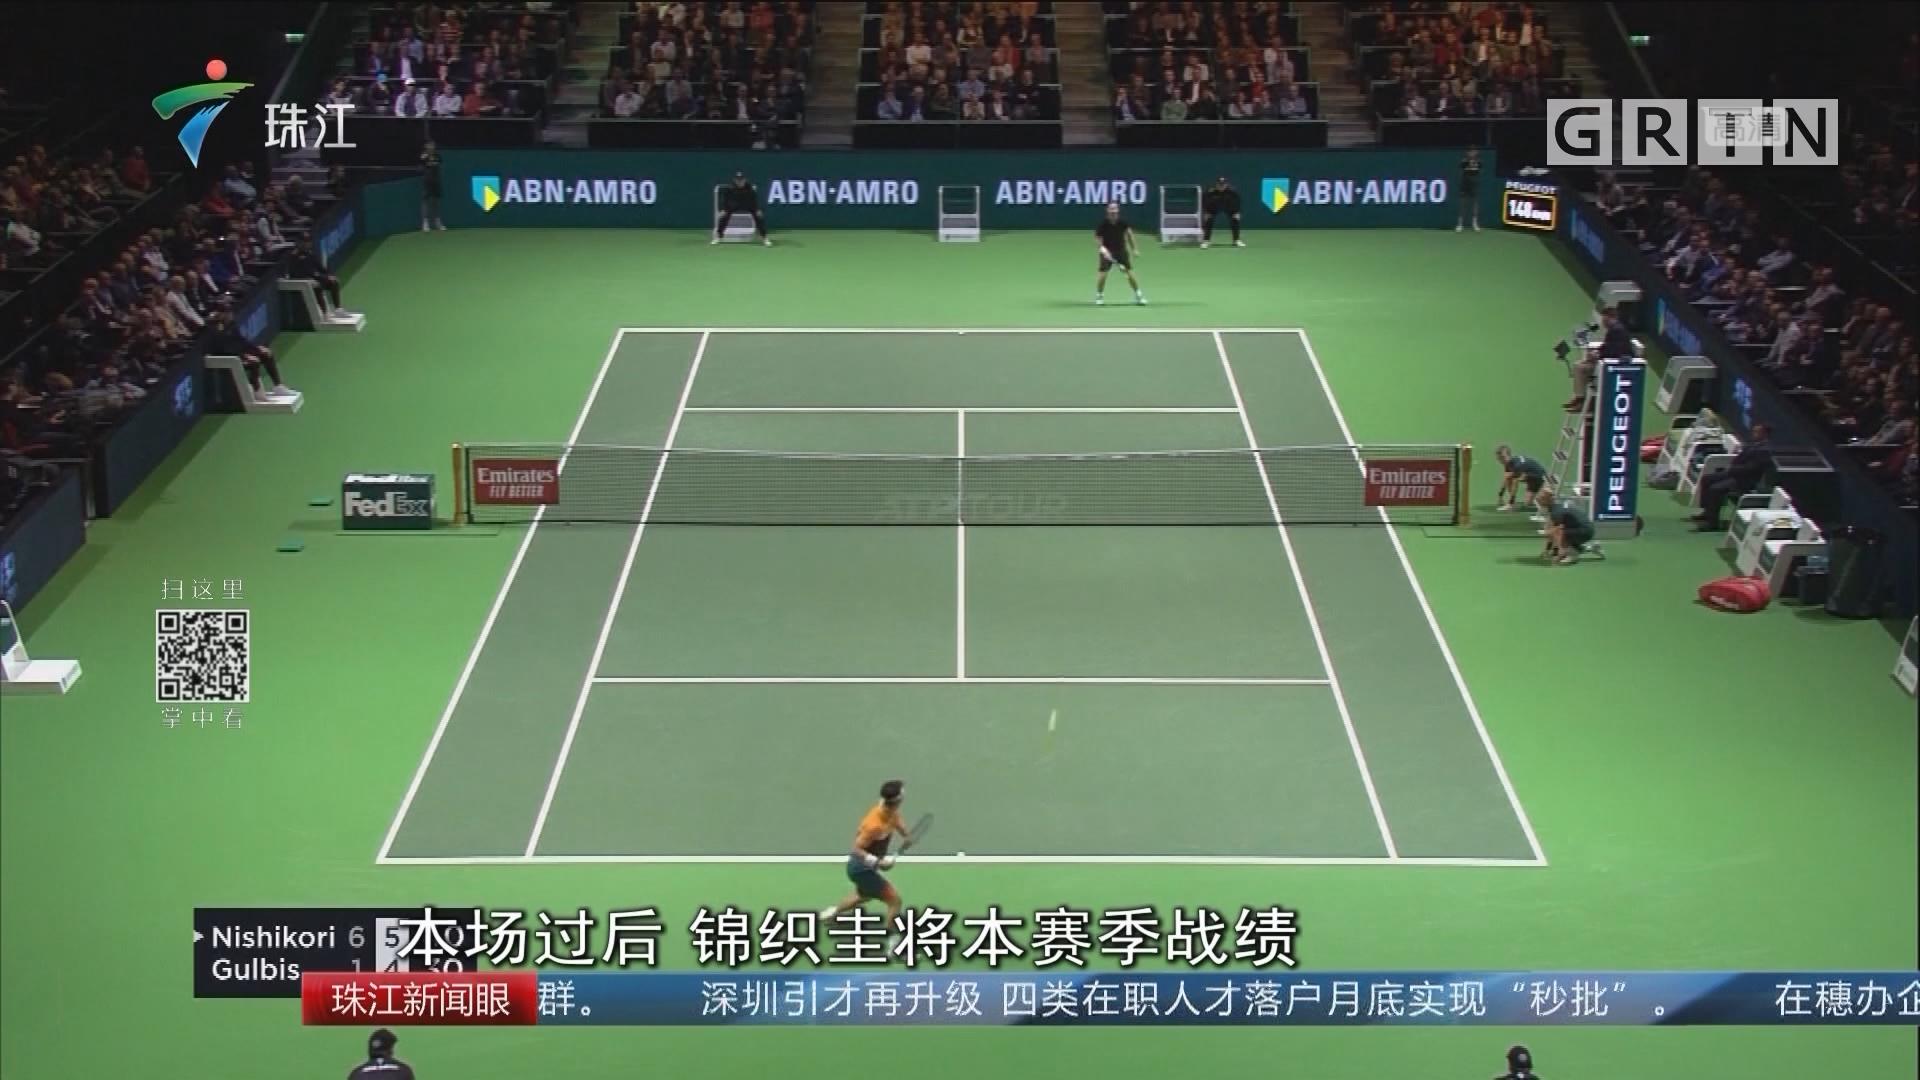 ATP鹿特丹站:锦织圭晋级八强